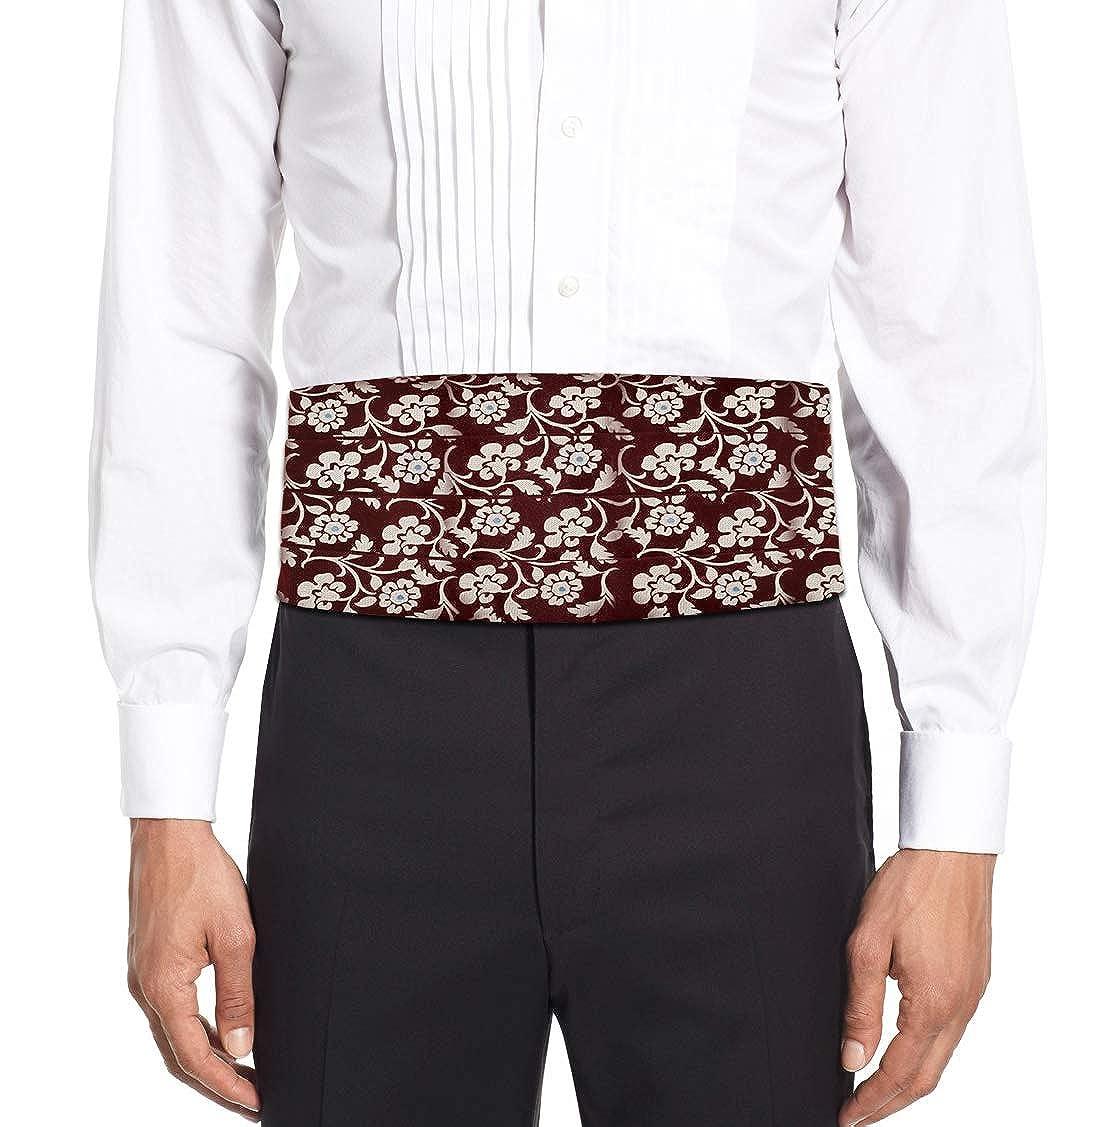 Remo Sartori Made in Italy Mens Burgundy Flower Cummerbund Tuxedo Belt Silk 4 Folded